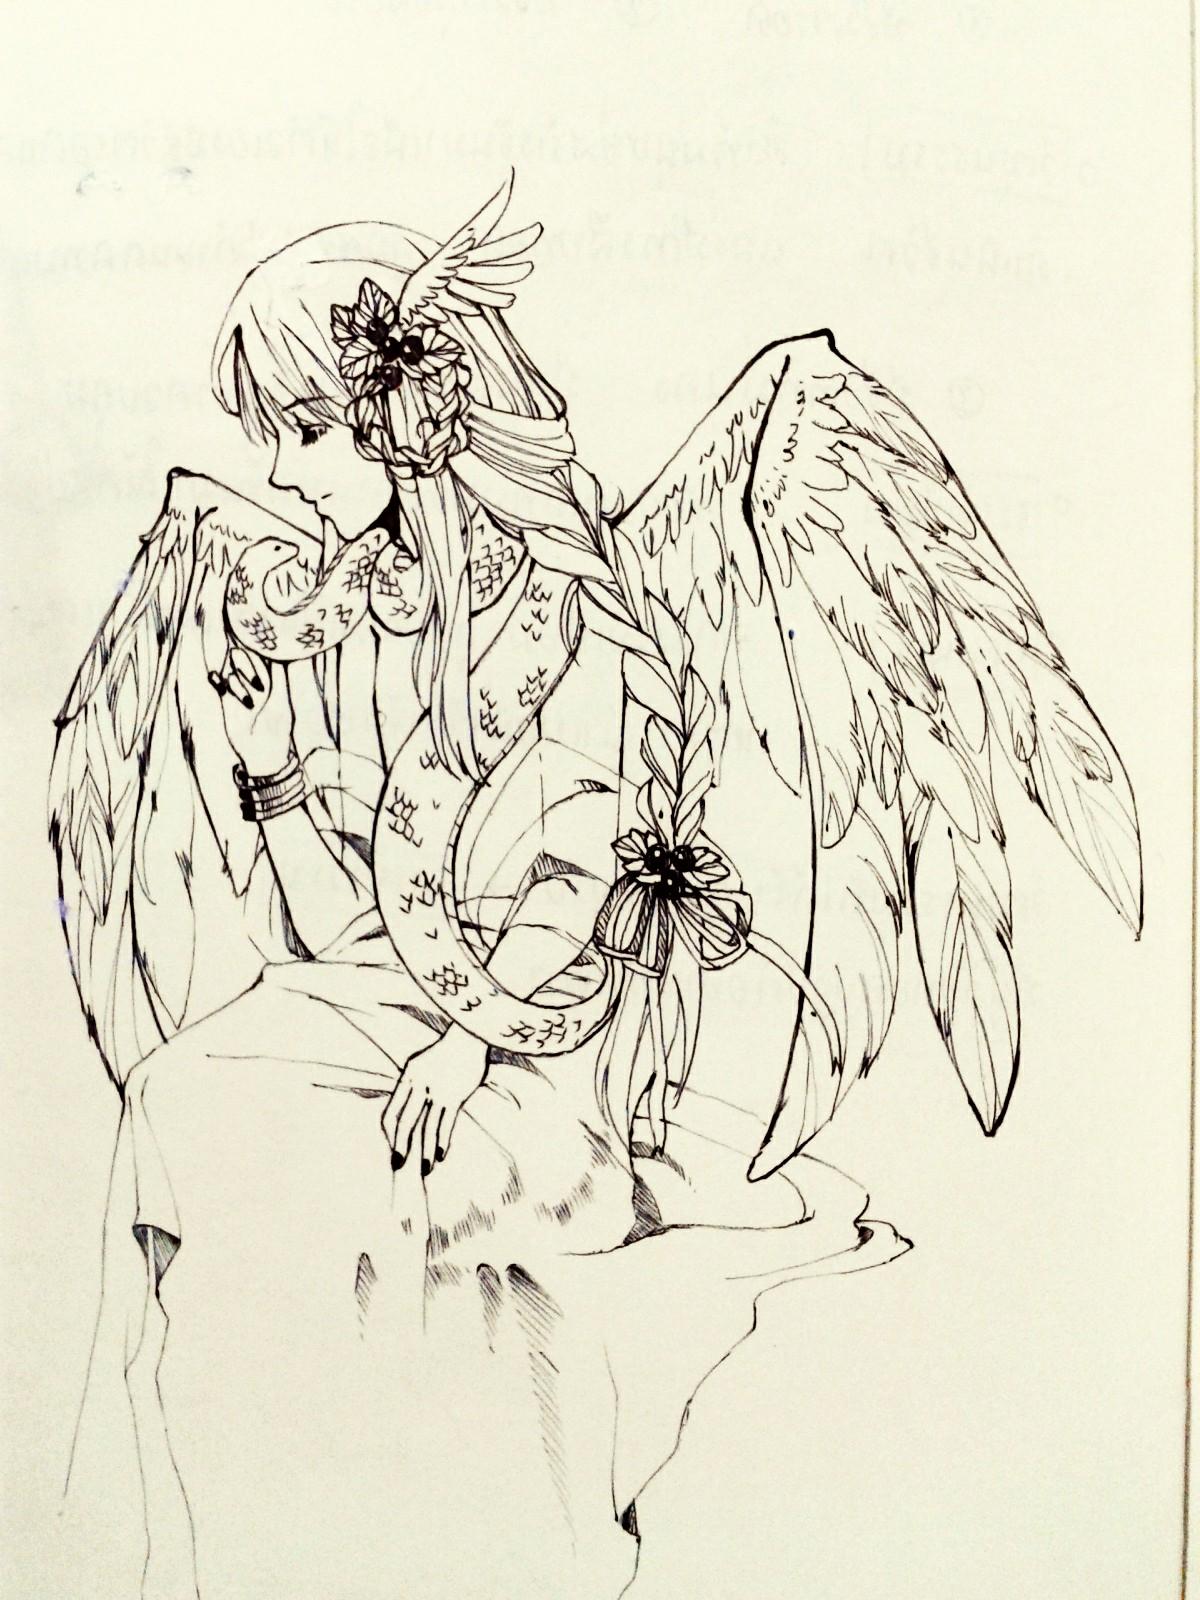 Sketch - Snake man by NuSinE